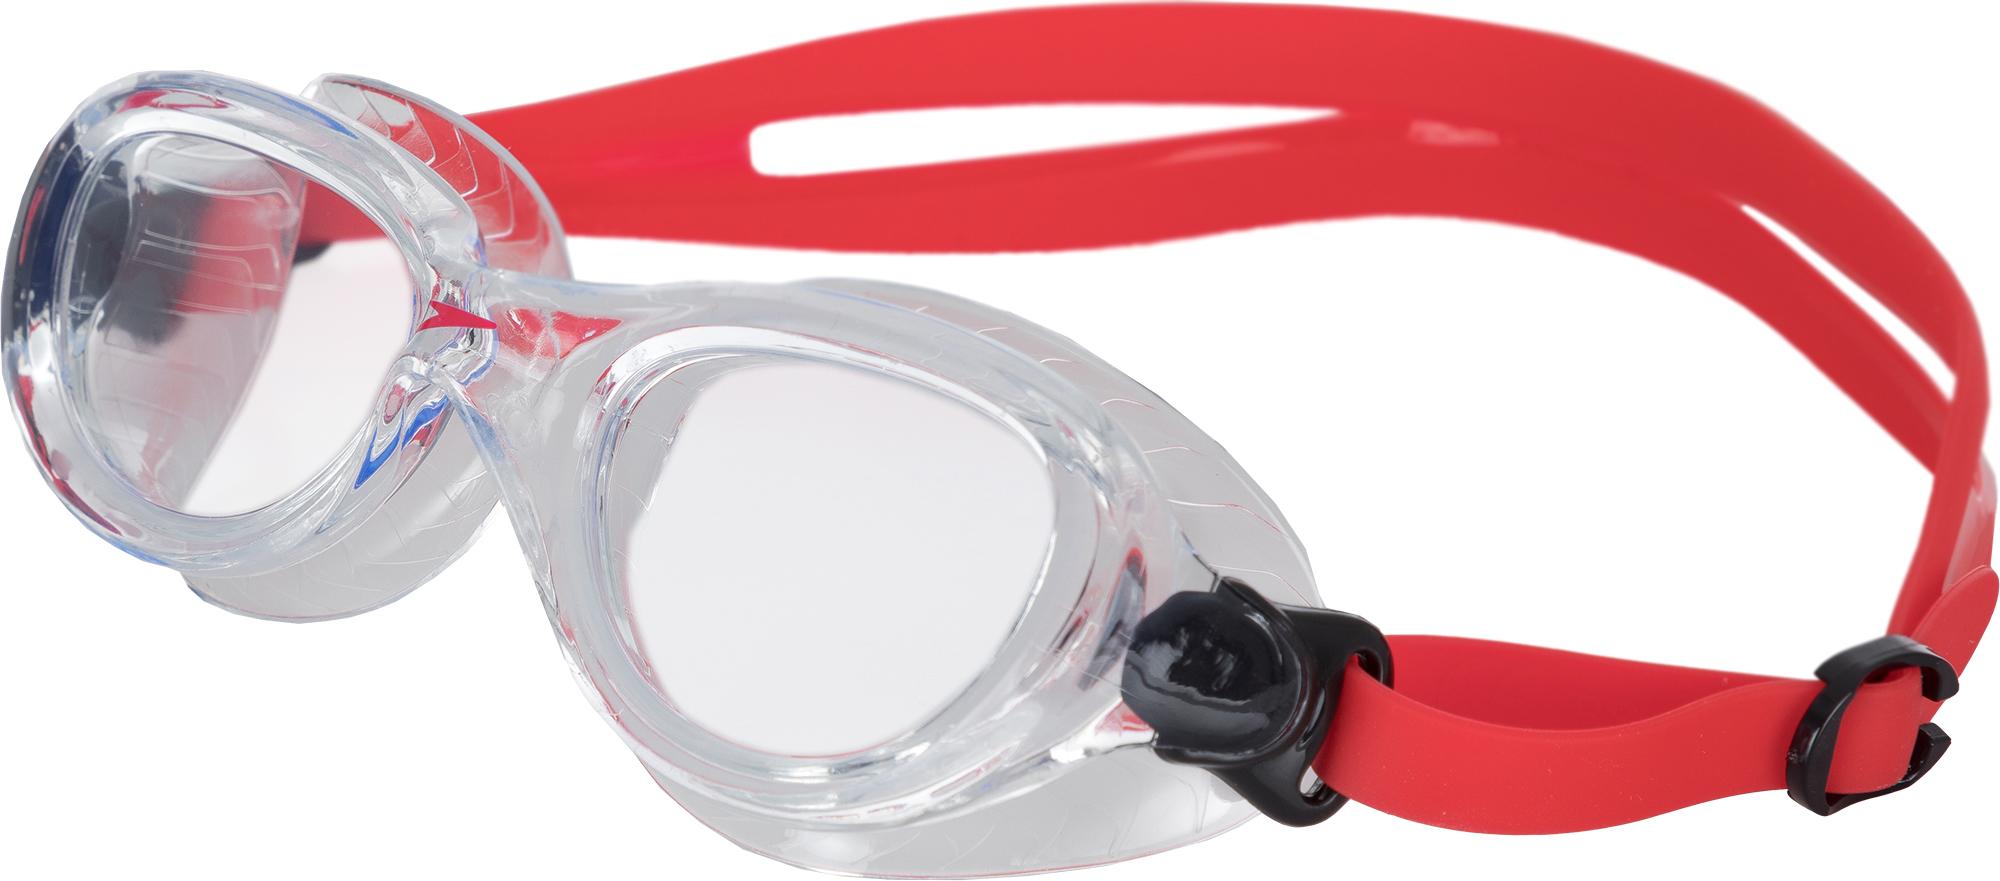 все цены на Speedo Очки для плавания детские Speedo Futura Classic онлайн